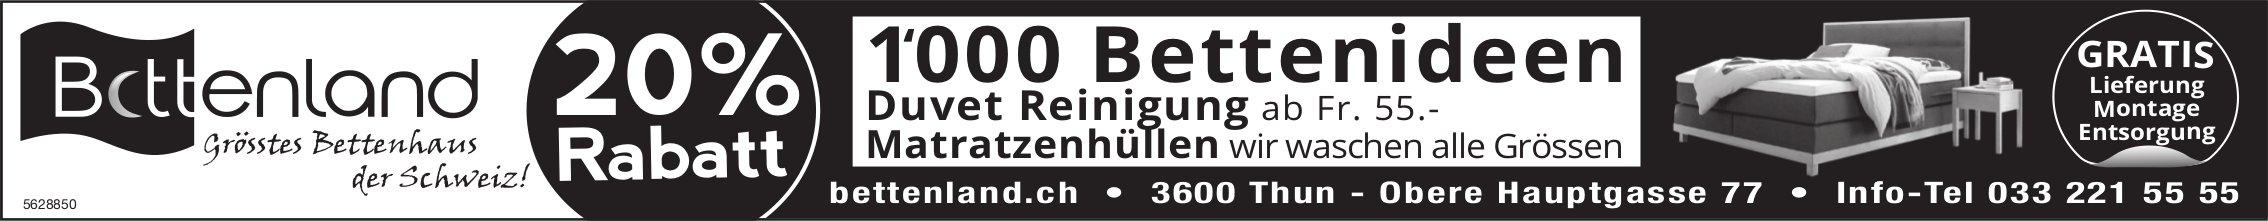 Bettenland, Thun - 20% Rabatt, 1'000 Bettenideen